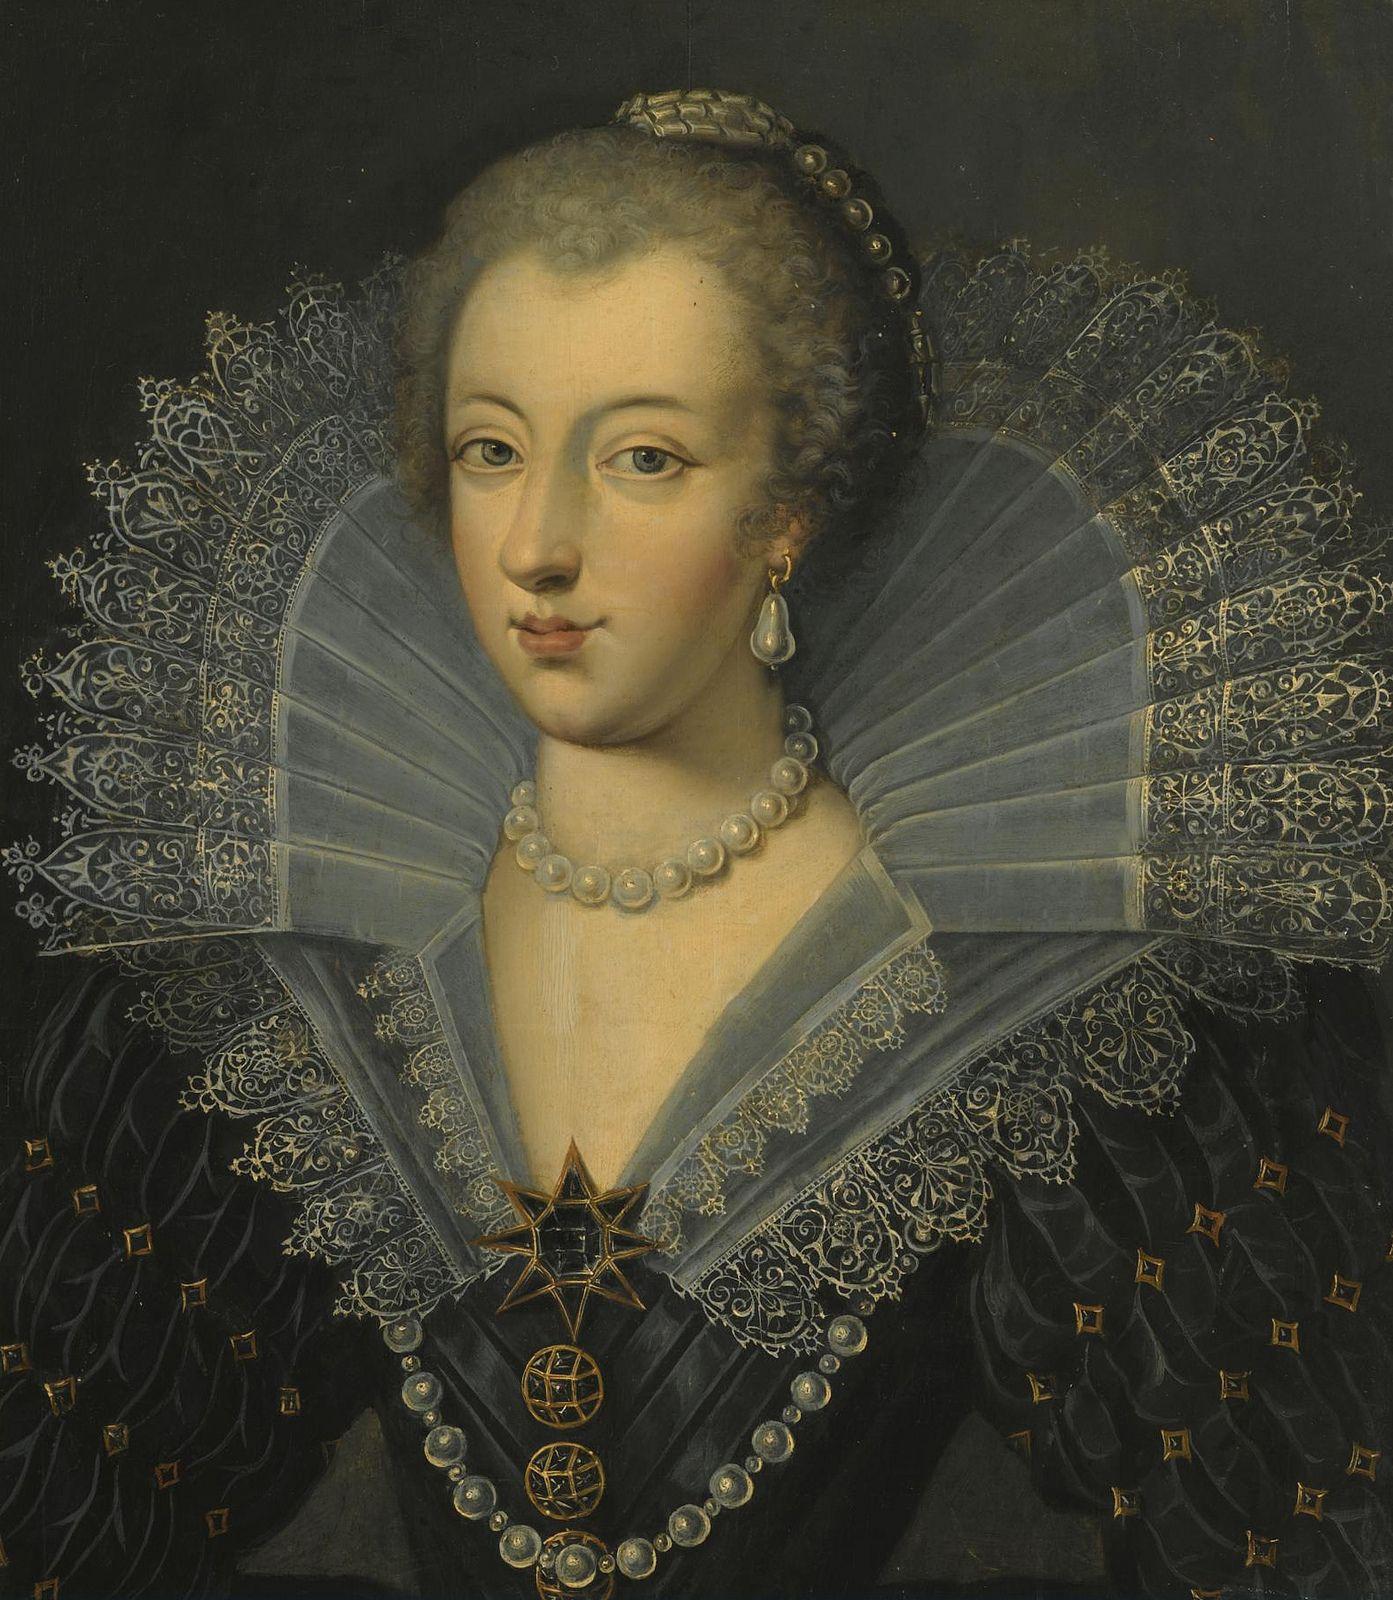 rencontre dame flemish brabant